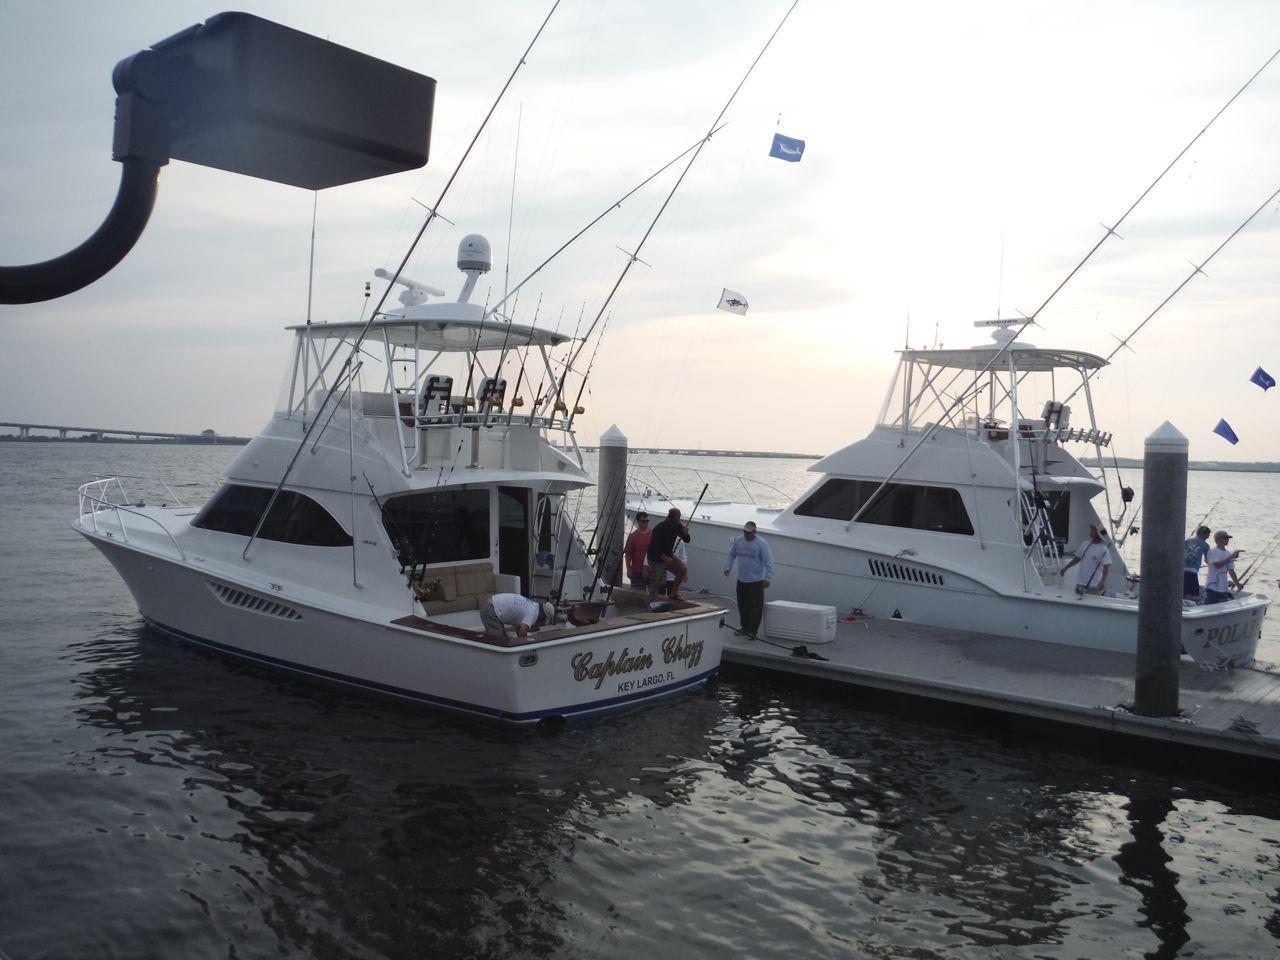 Ocean city marlin tuna club boats fishing the annual